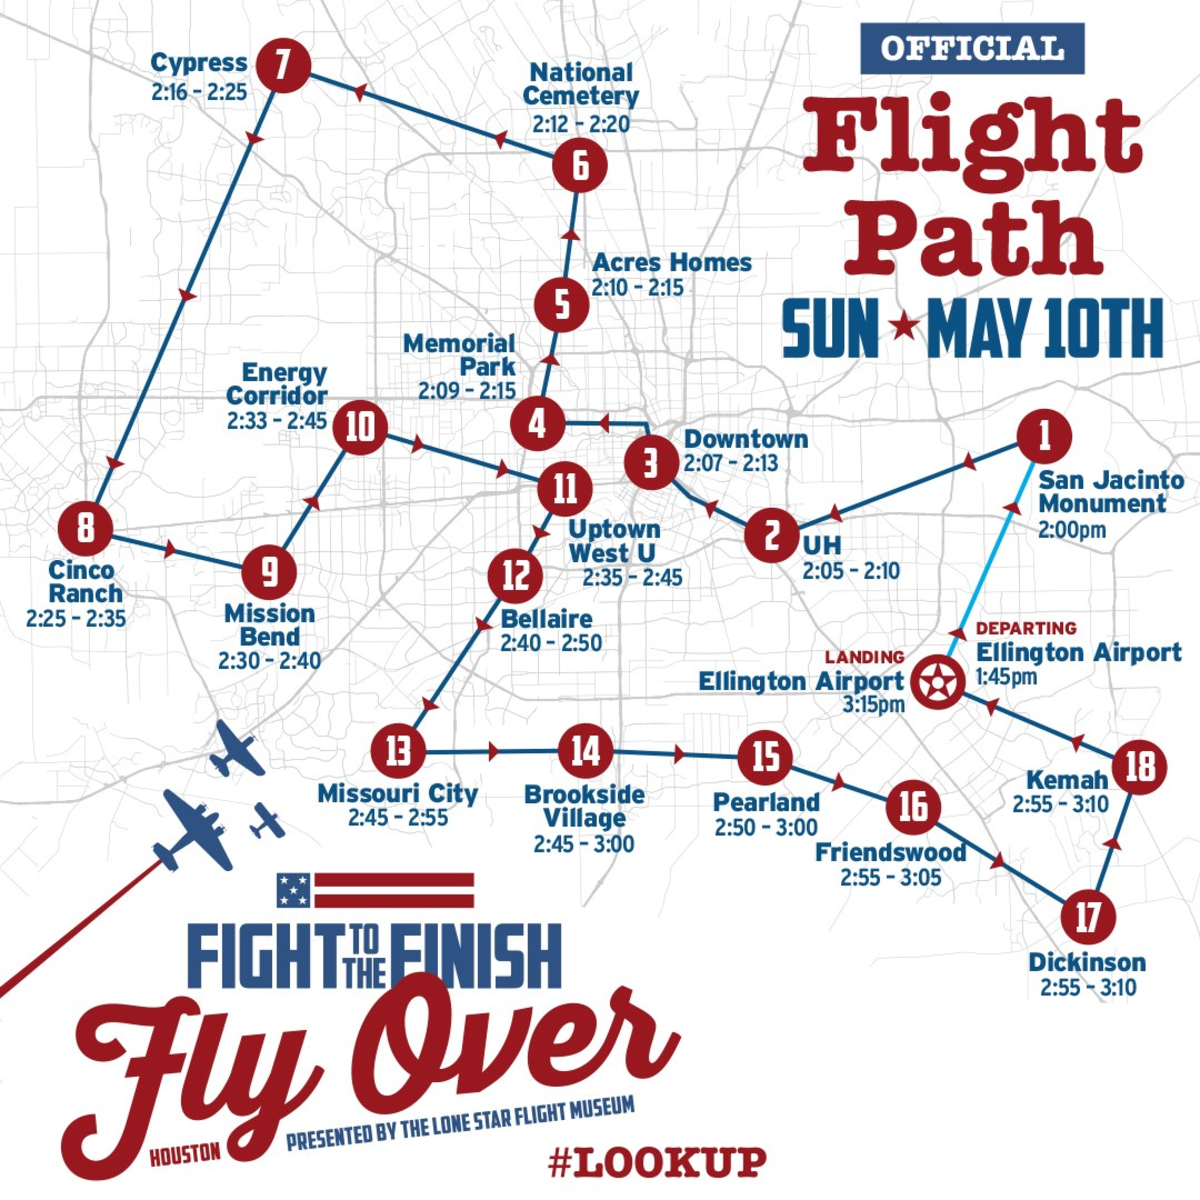 Lone Star Flight Museum Flyover WWII Houston flight path